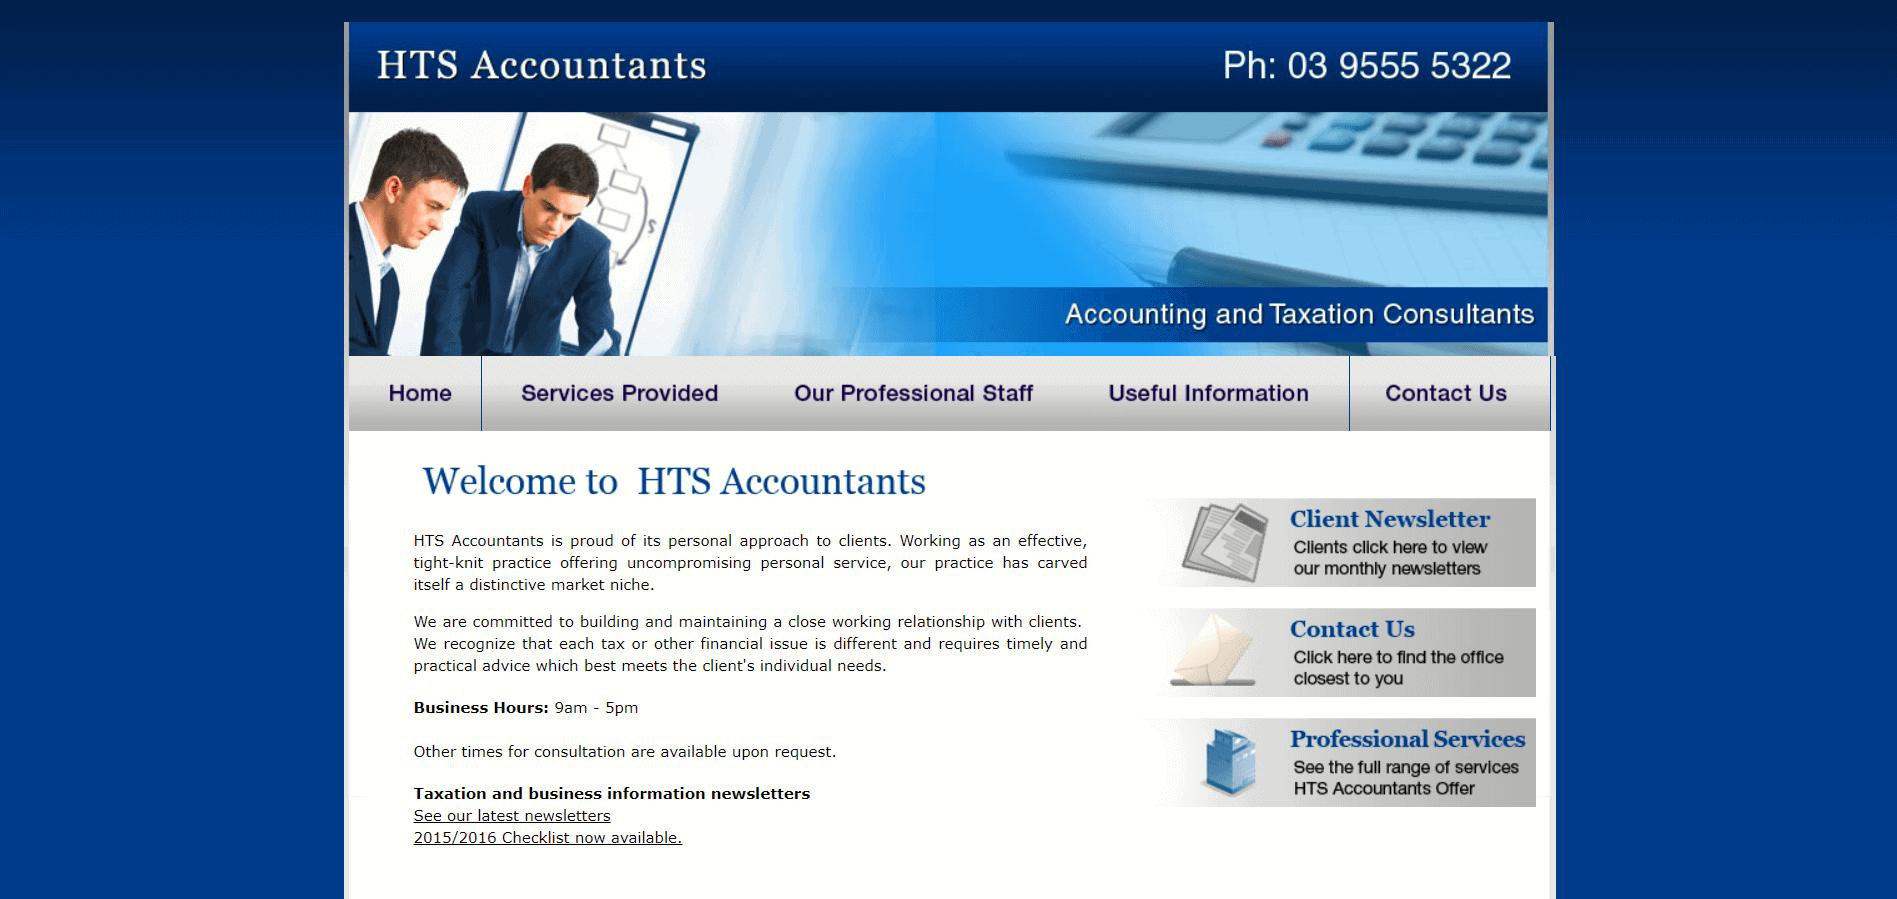 Hts Accountants